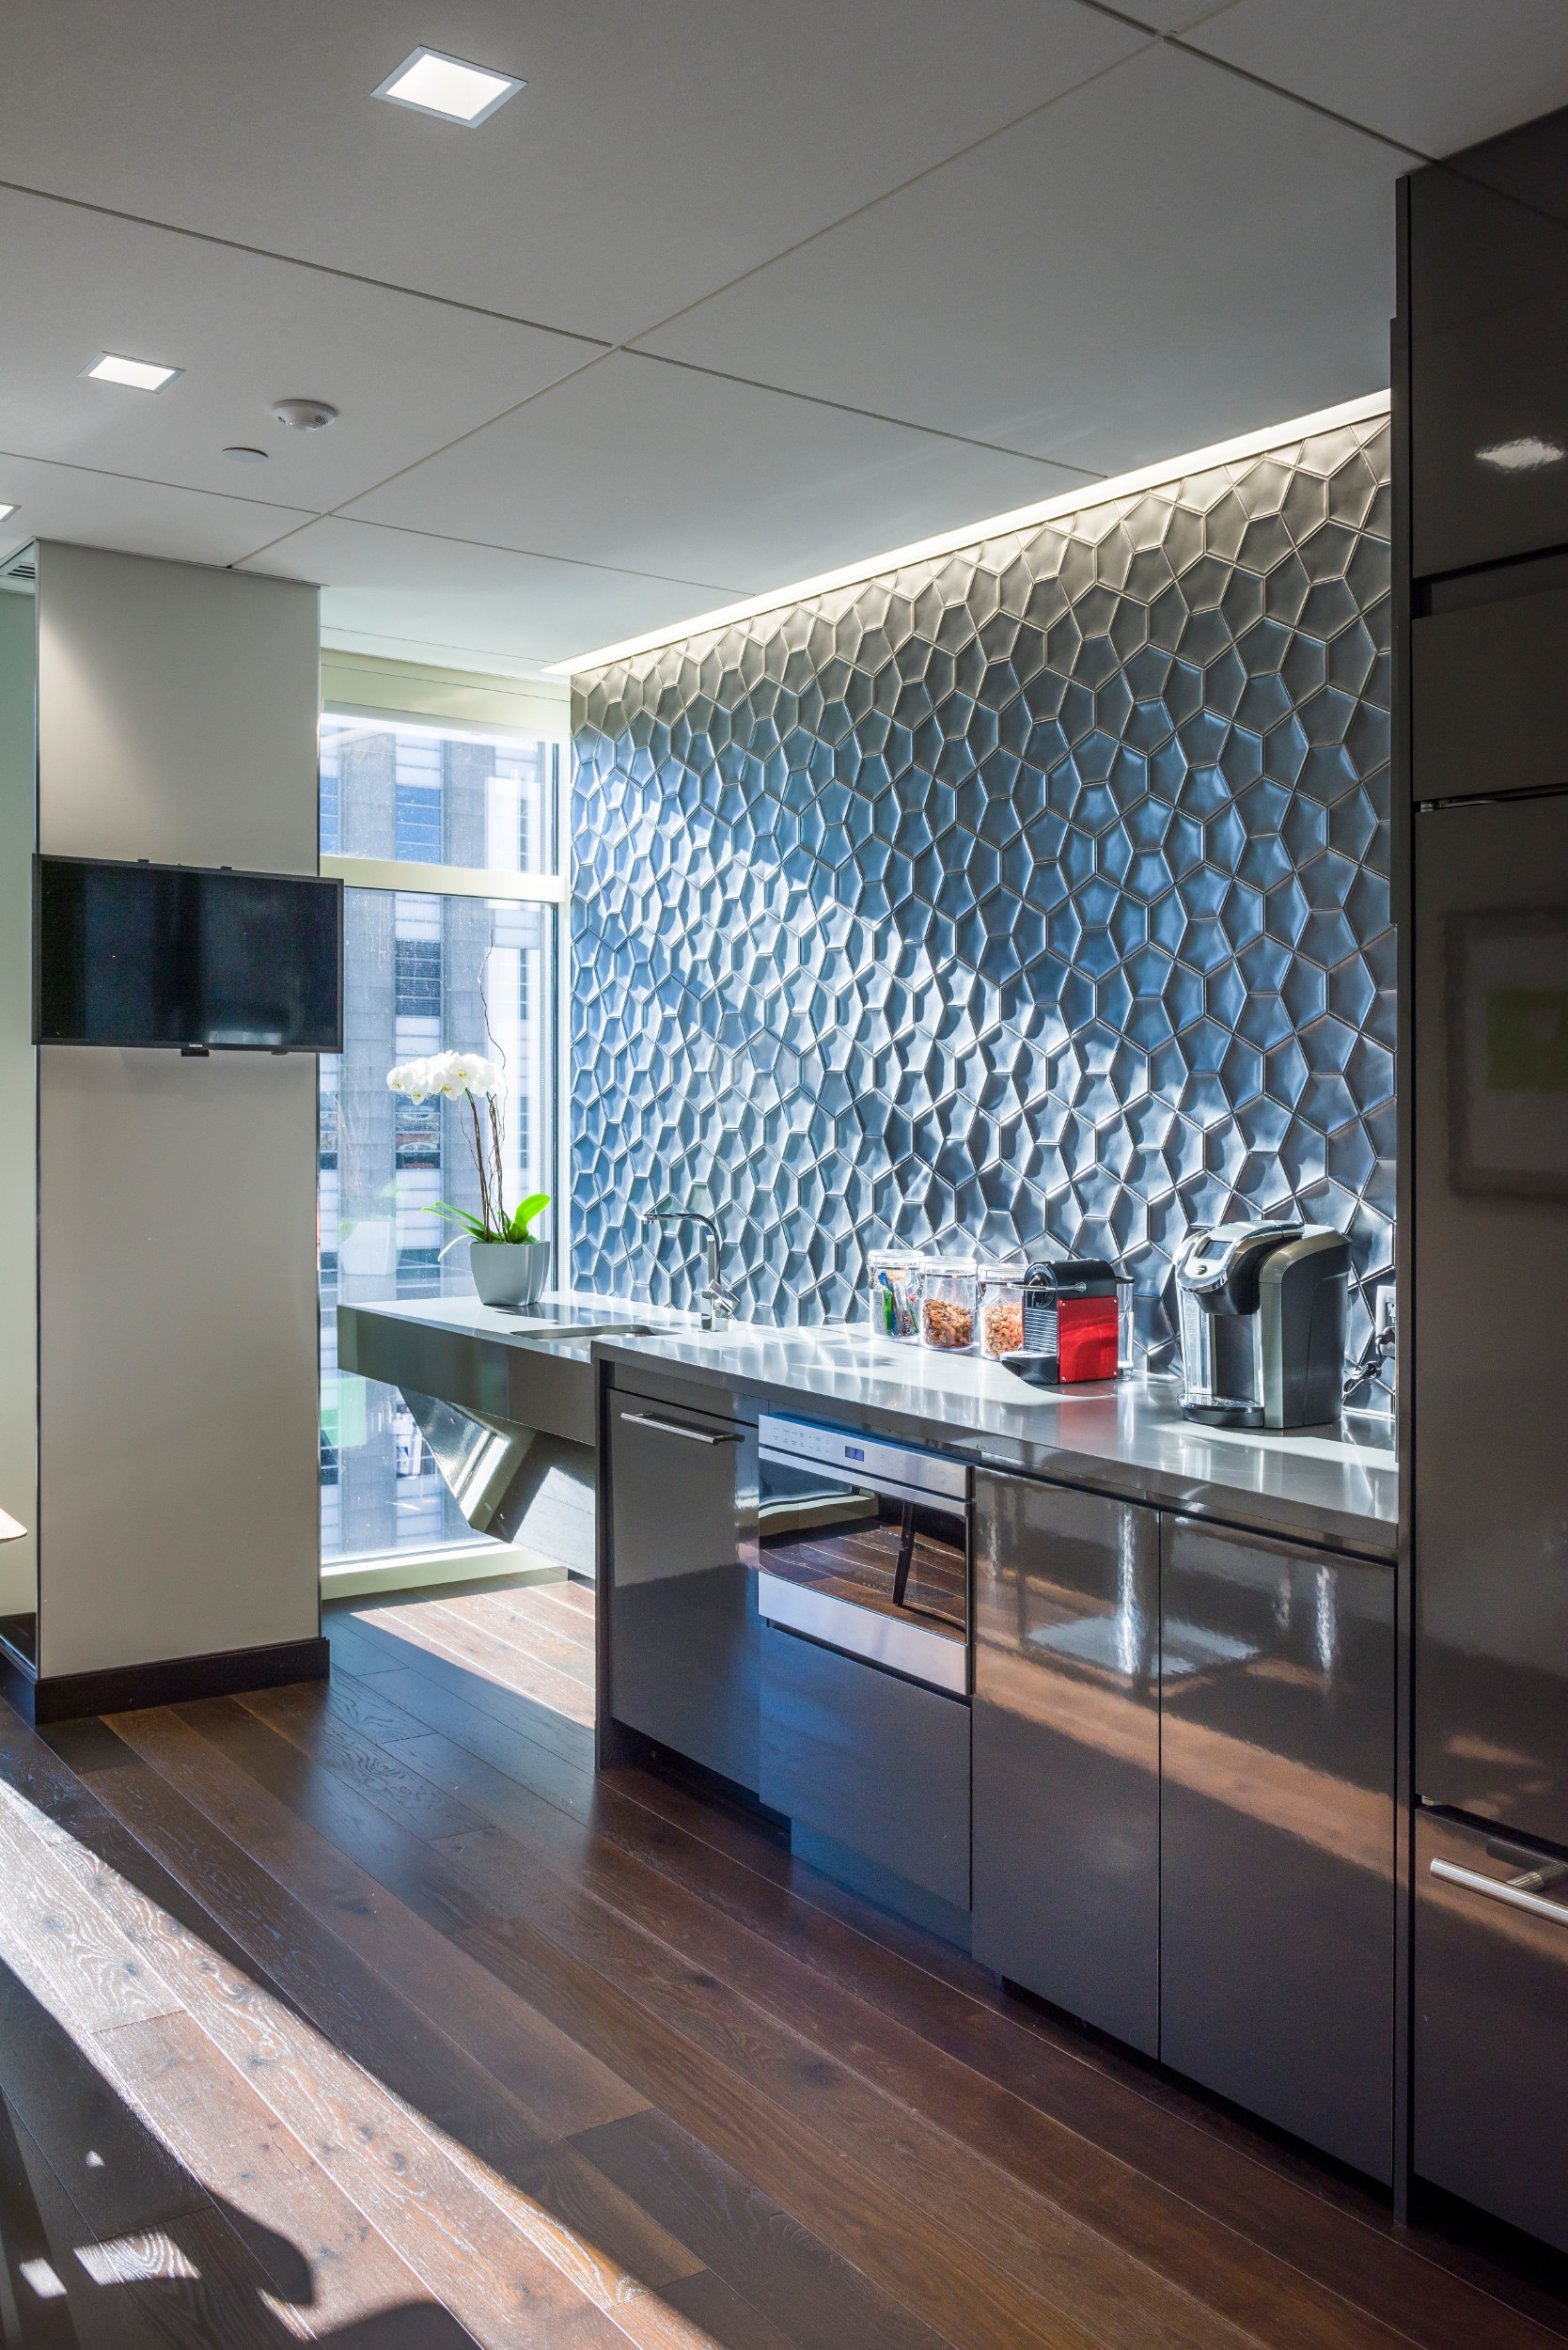 Corderman_Construction_Martignetti_Companies_Interior_Office_Buildout_Kitchen.jpg